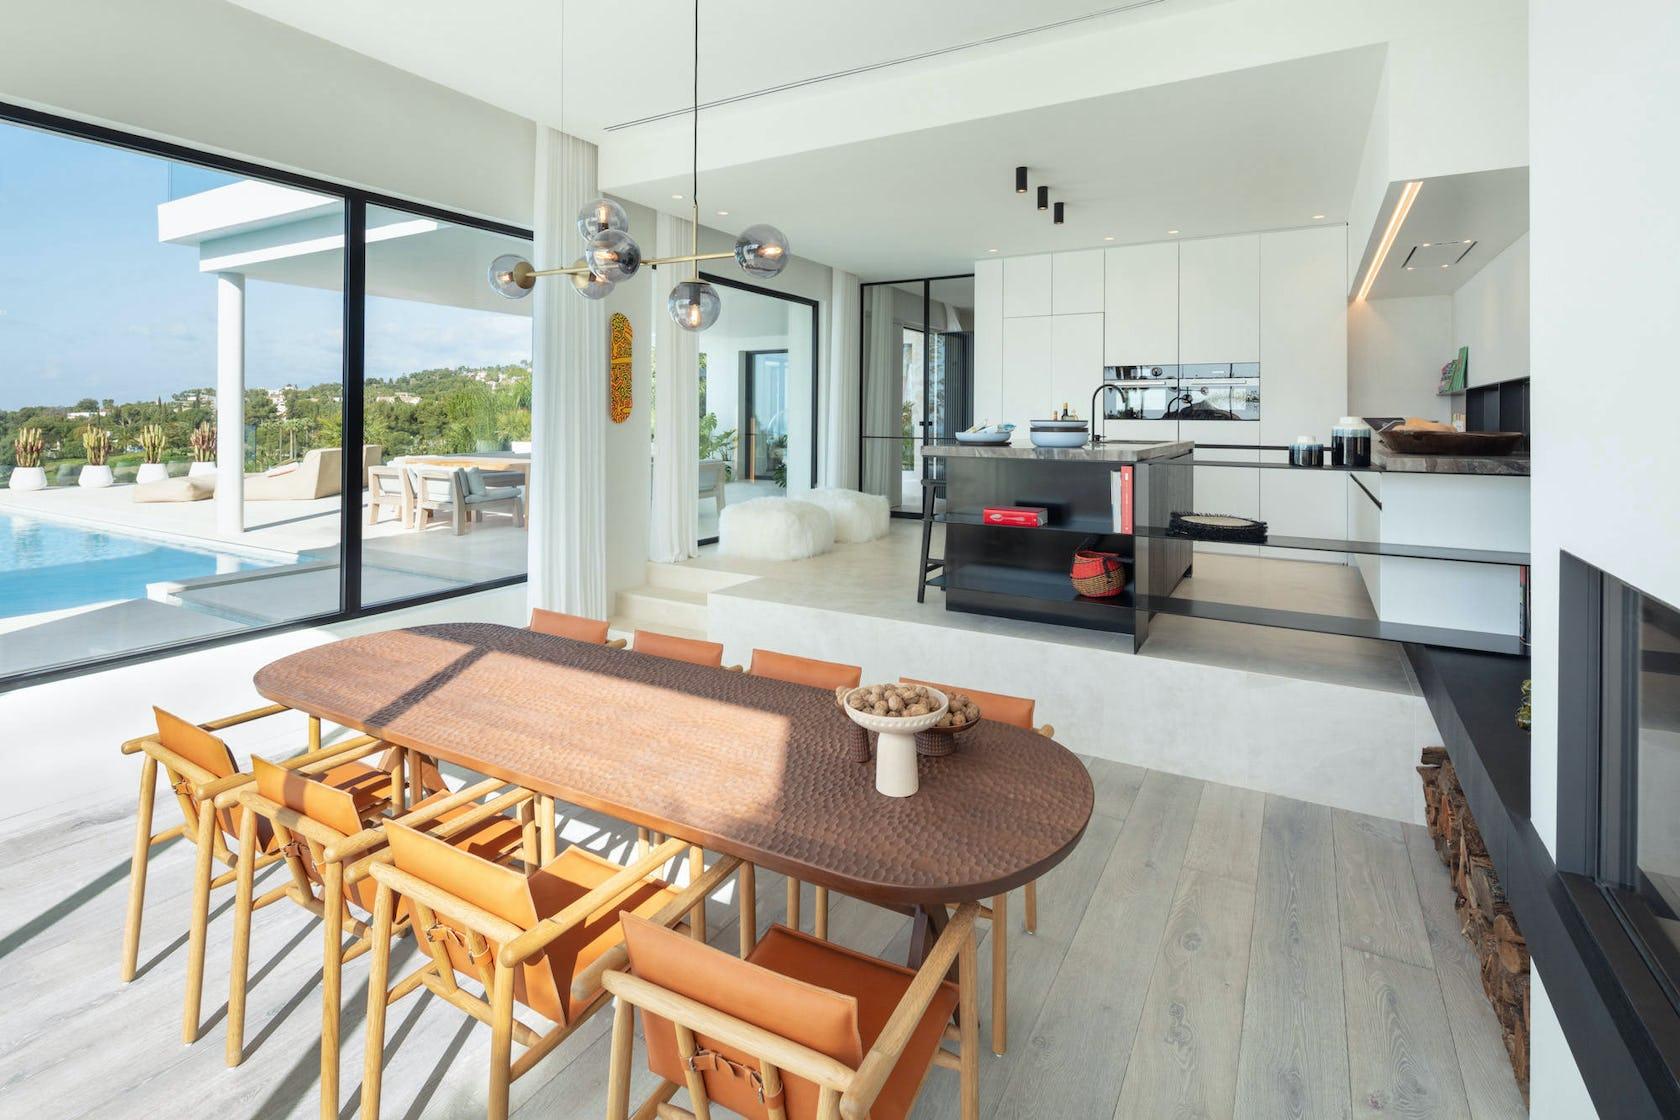 chair furniture interior design indoors flooring wood room housing building